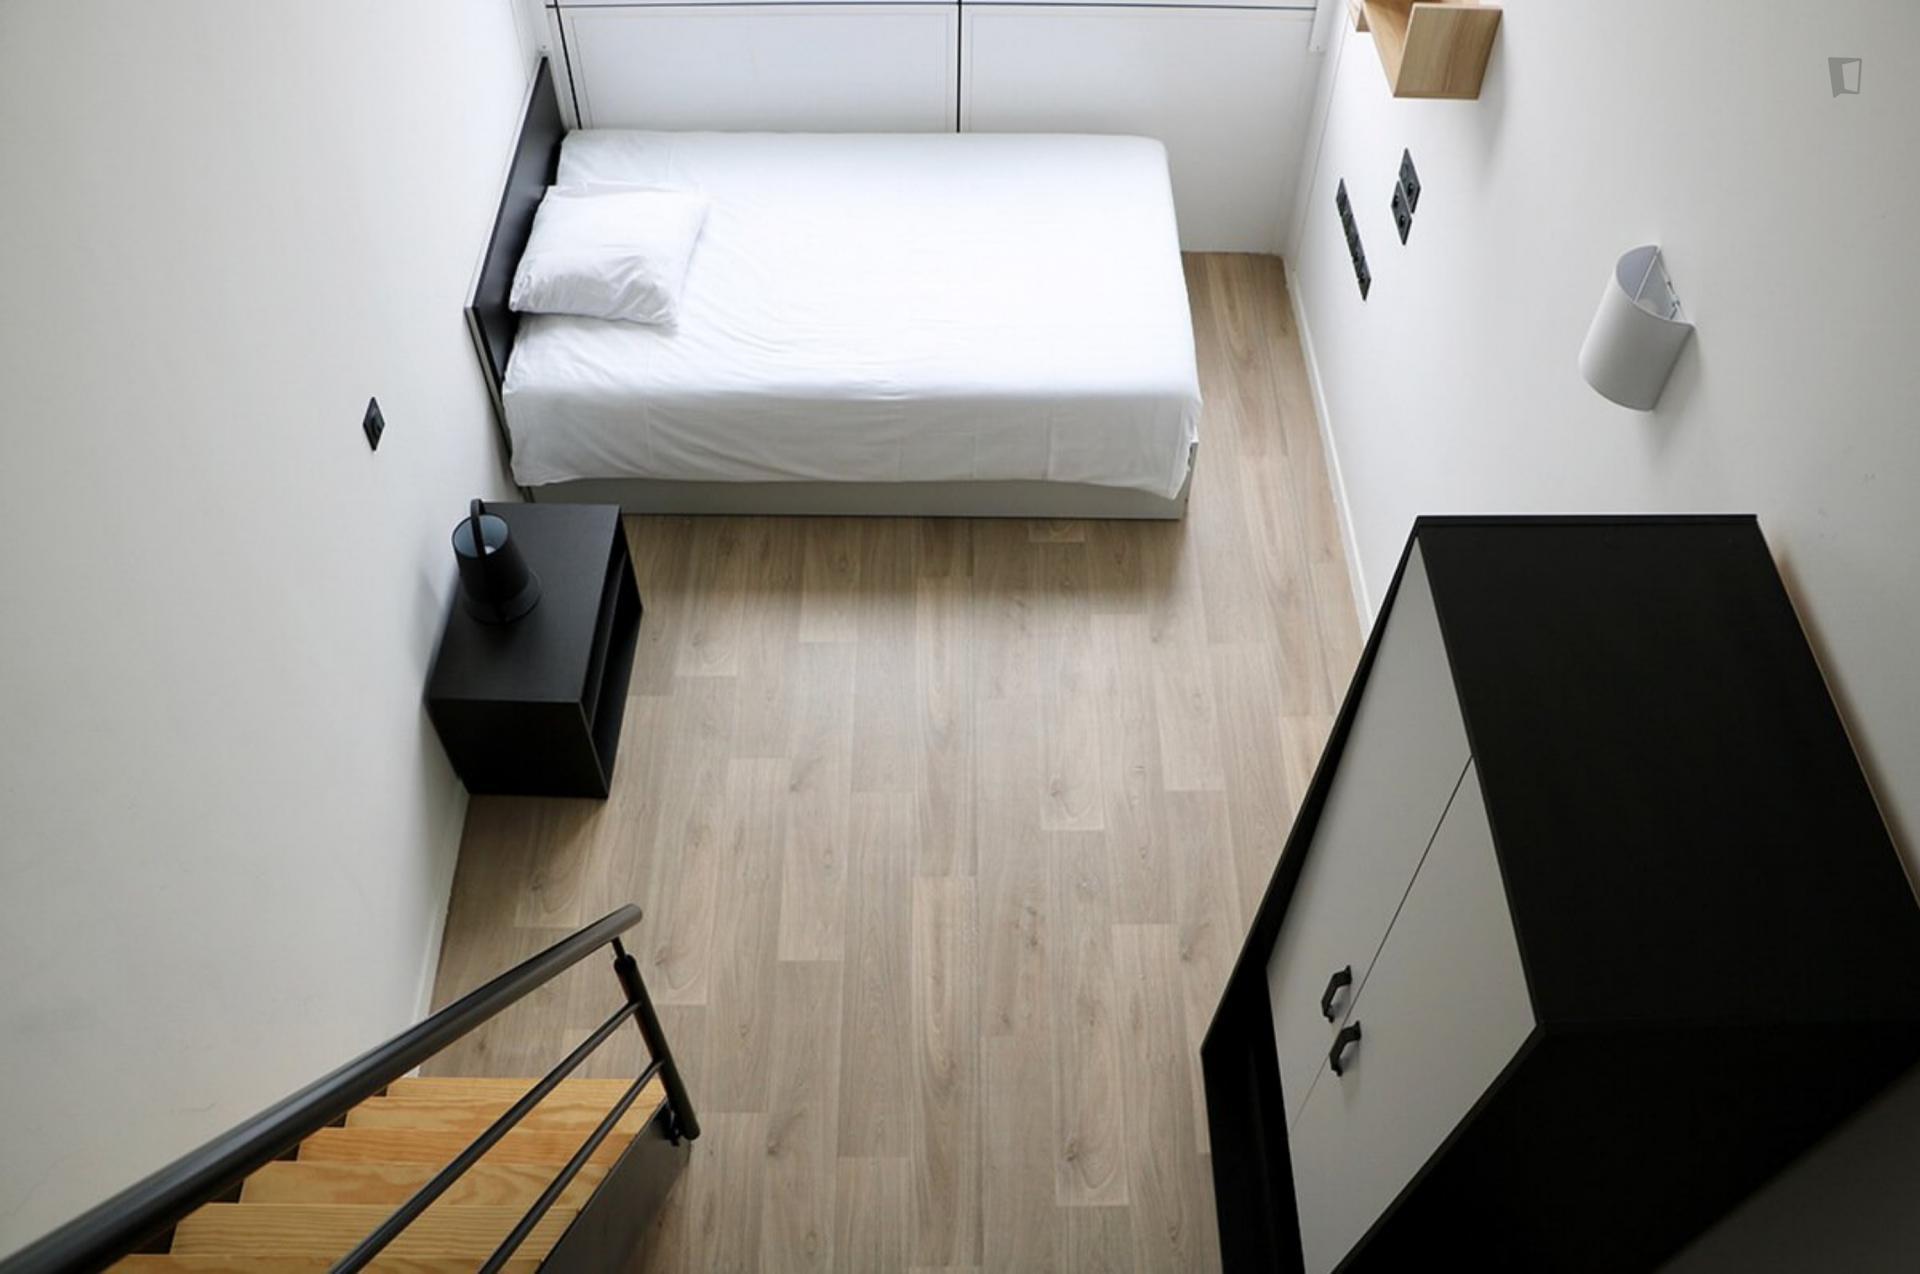 Bedroom in student residence duplex in France